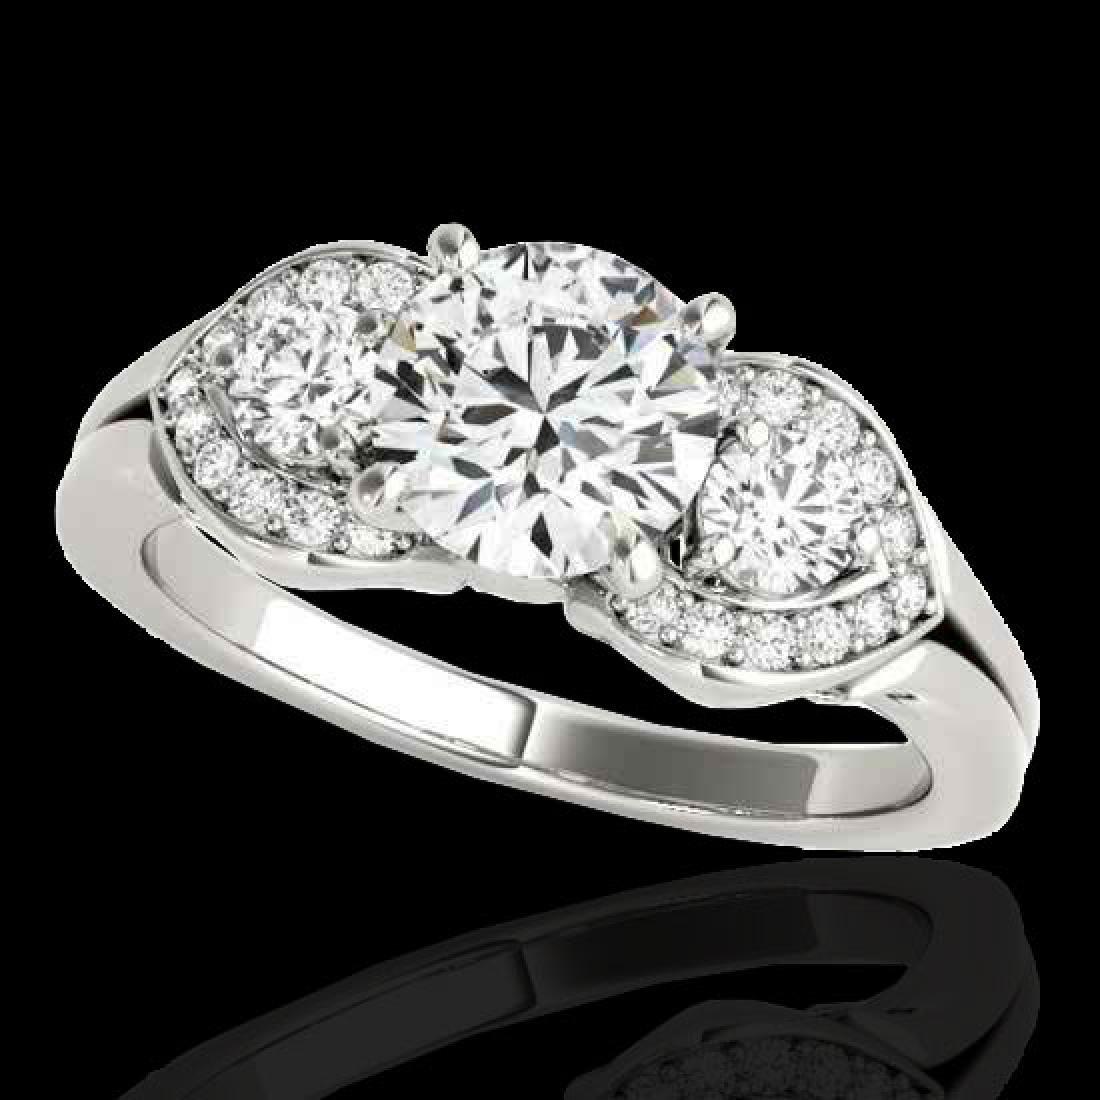 1.7 CTW H-SI/I Certified Diamond 3 Stone Ring 10K White